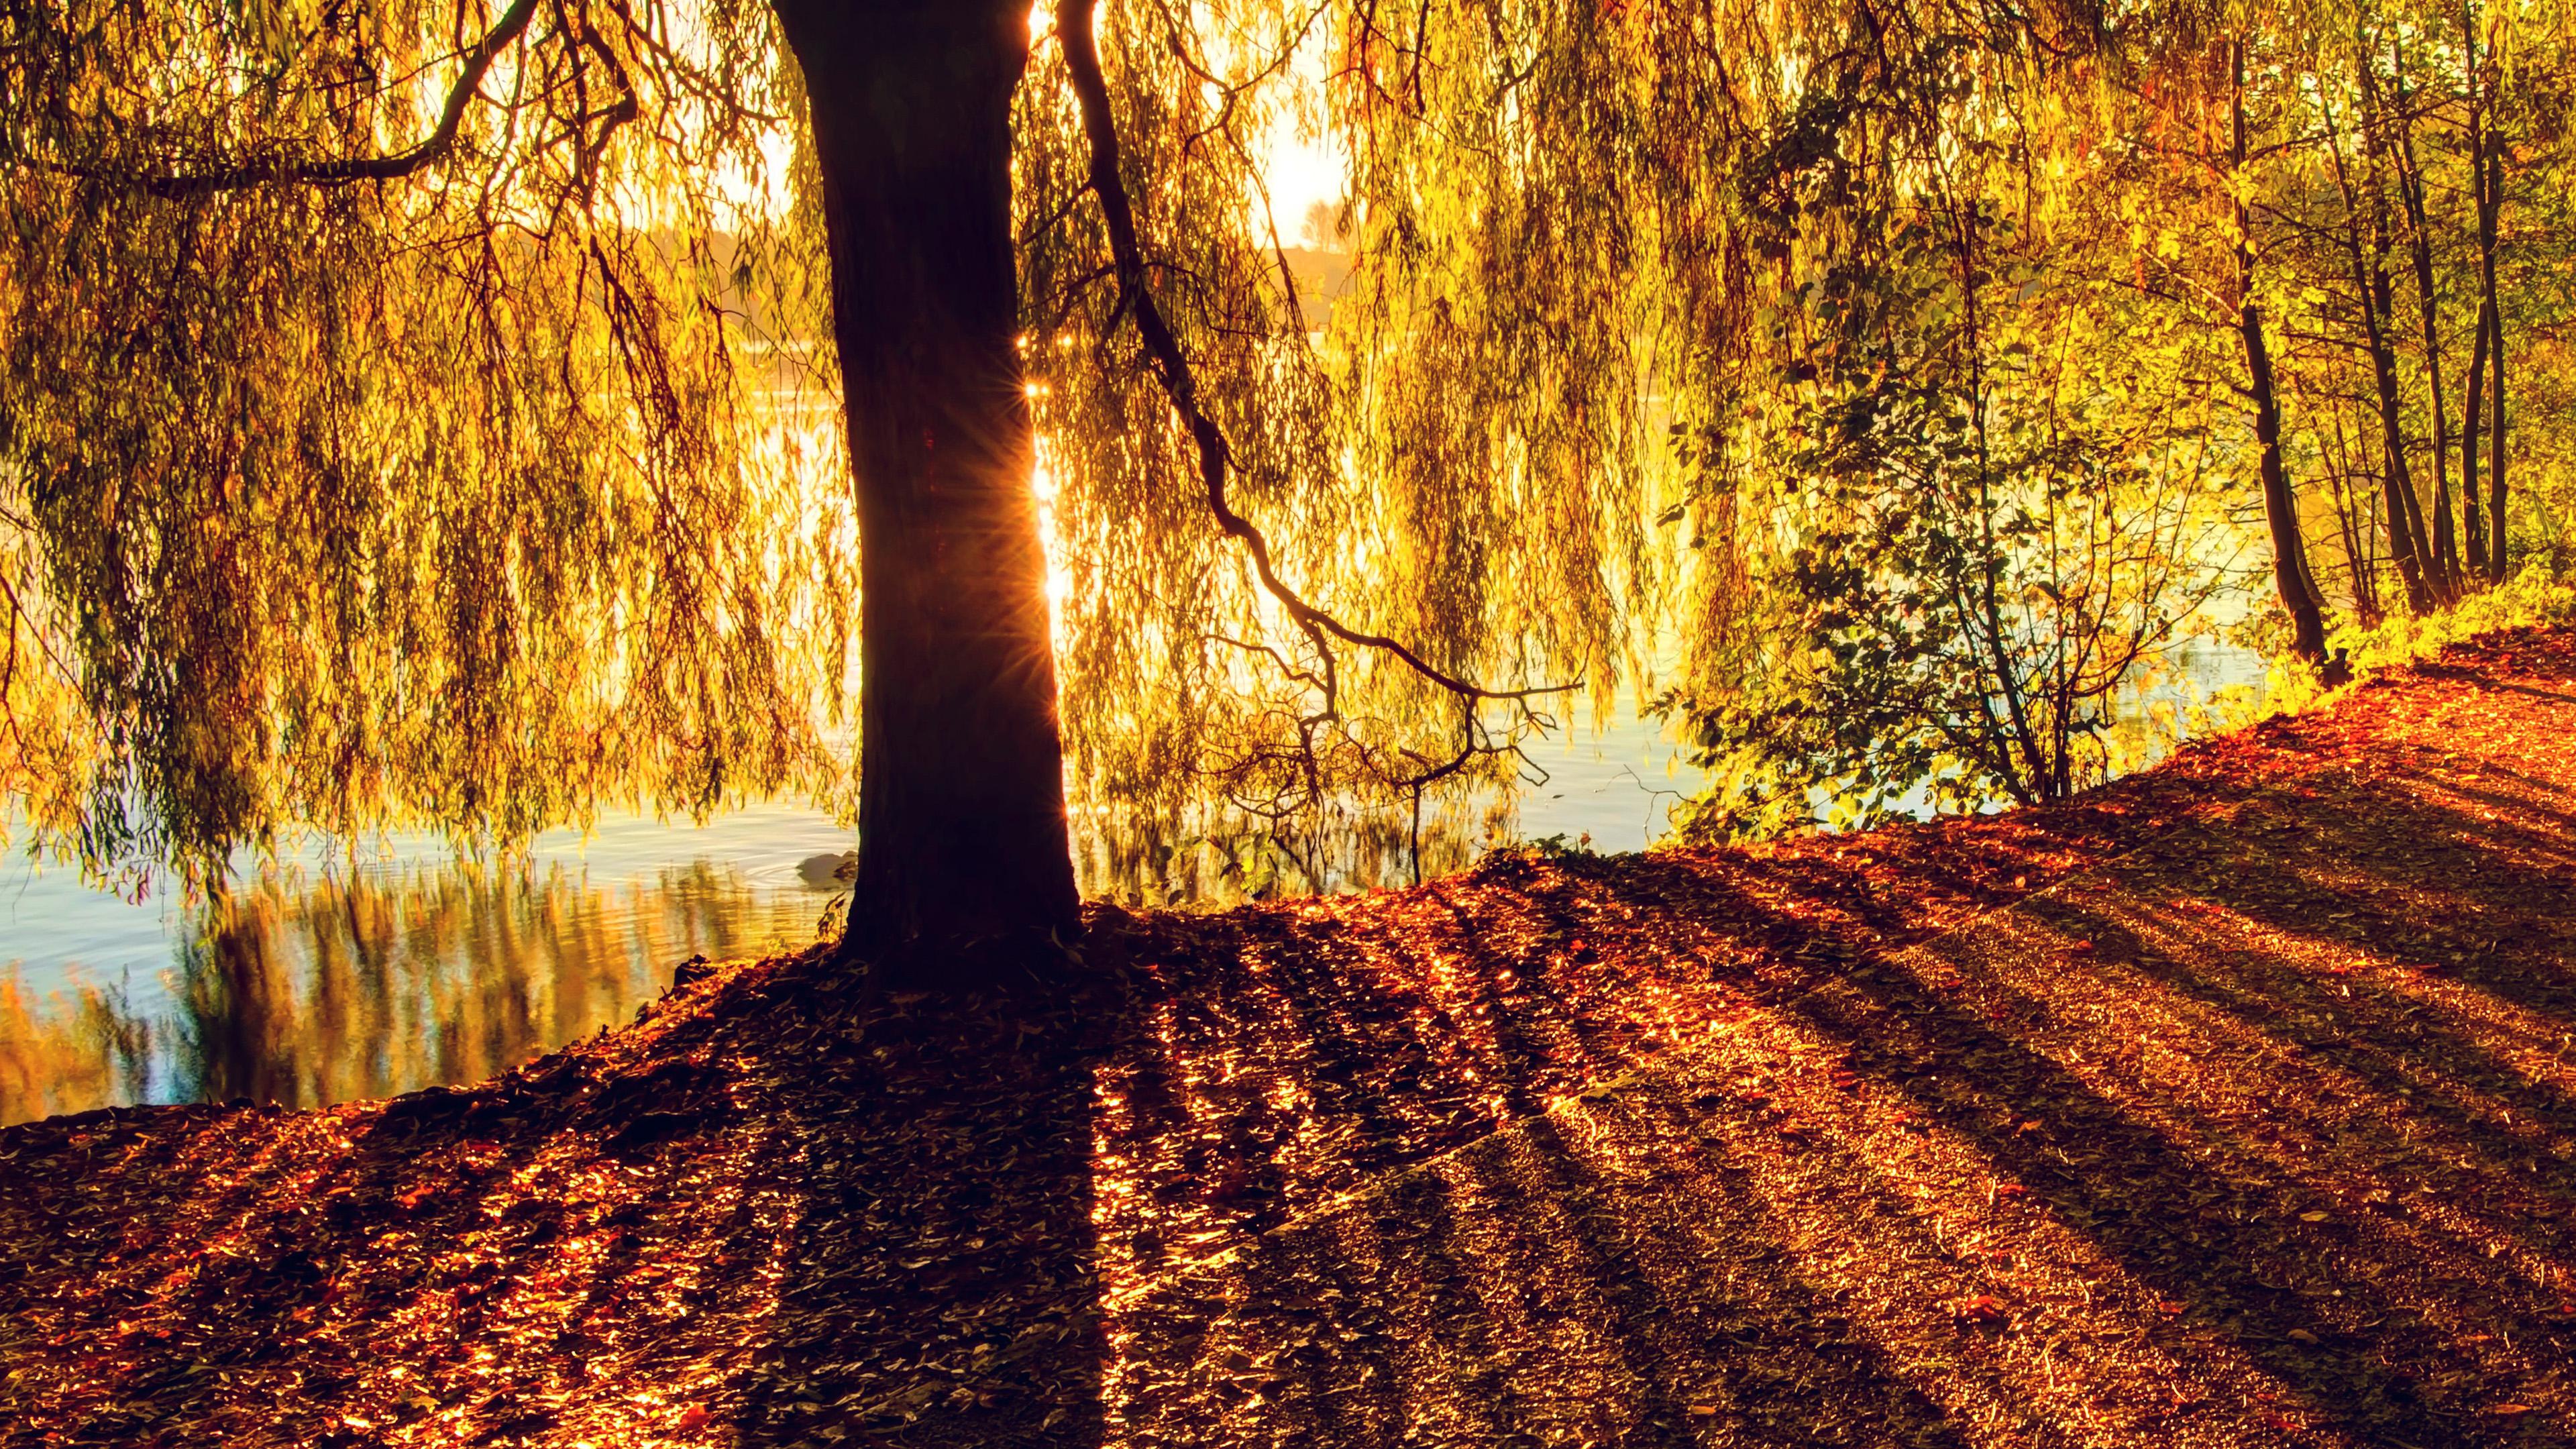 Nature Sunshine Galaxy S4 Wallpapers: 3840 X 2400